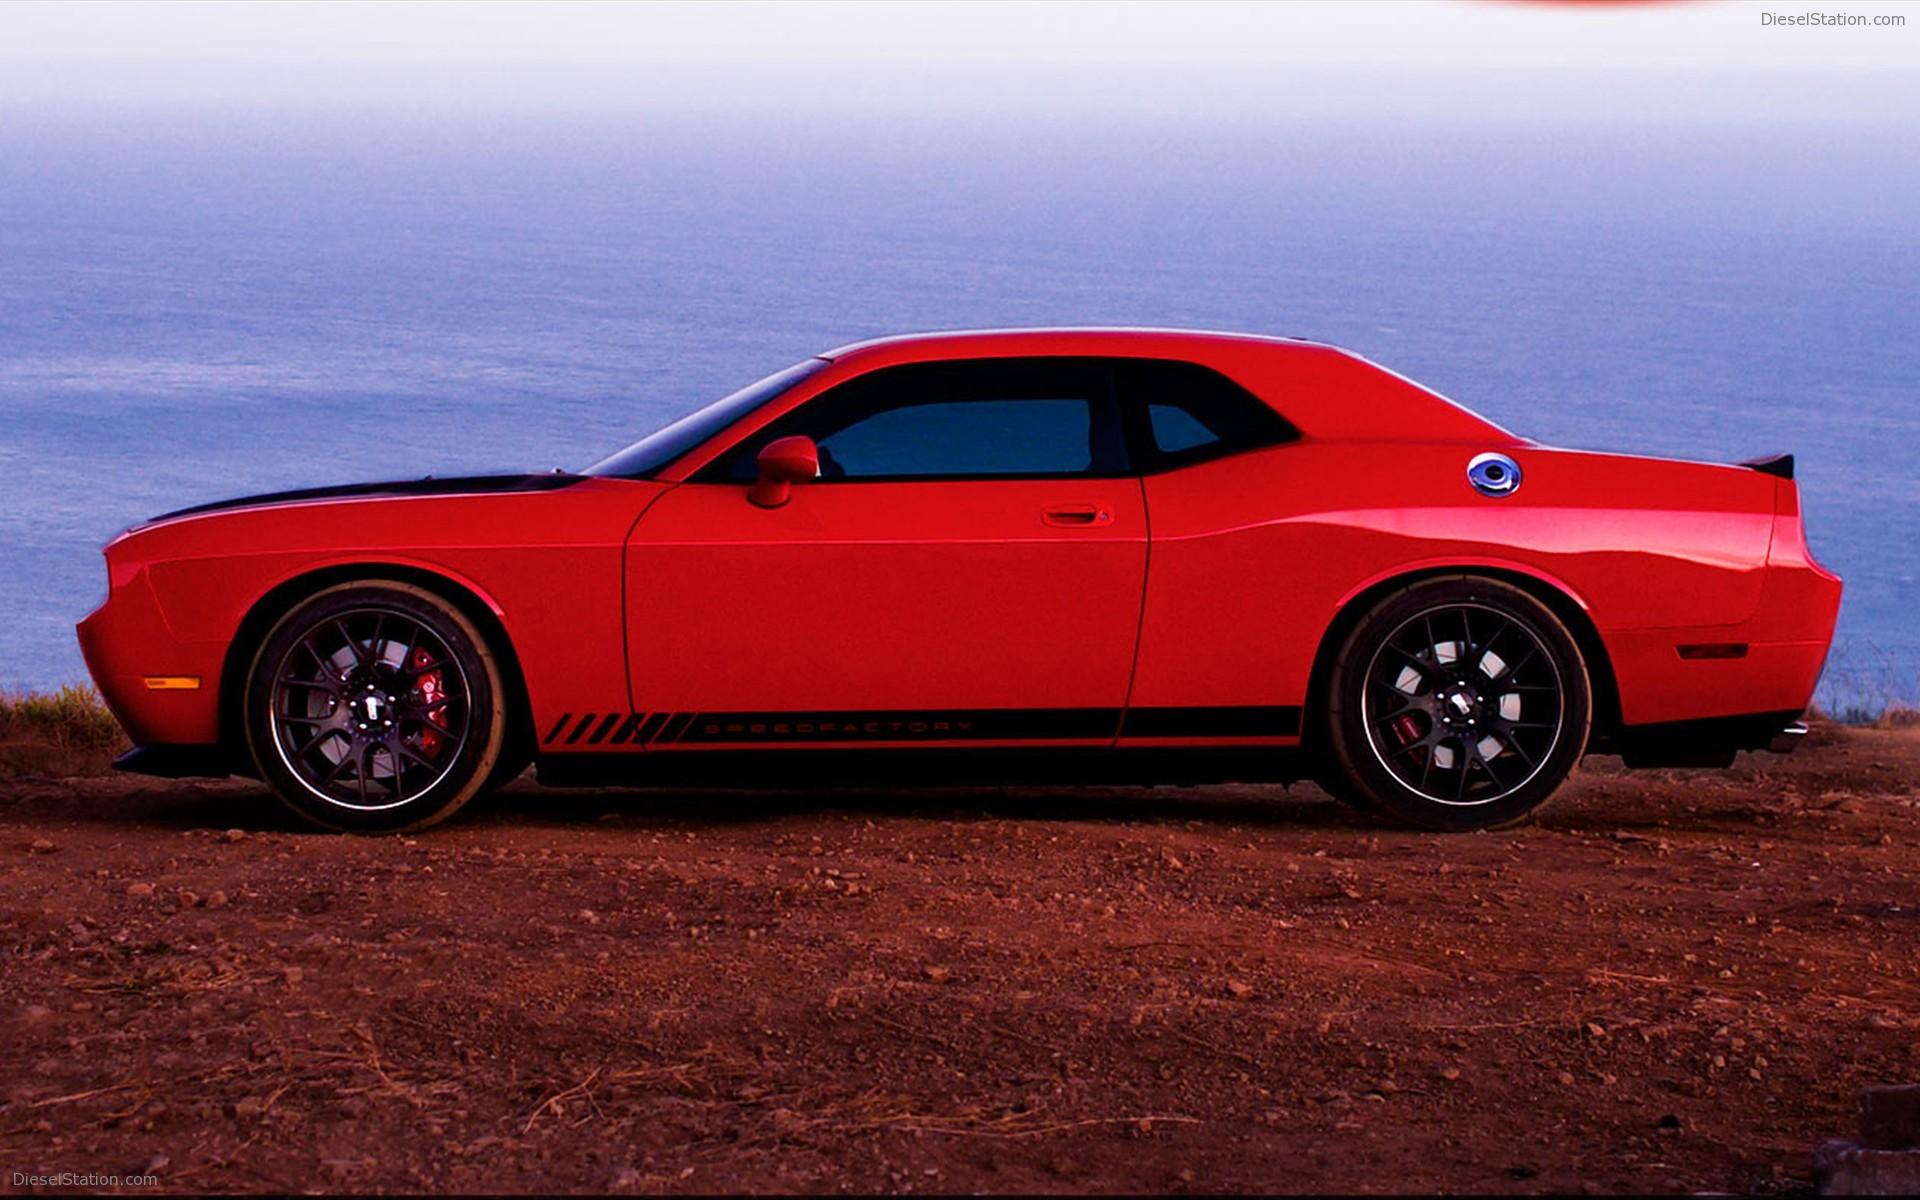 Speedfactory Dodge Challenger Widescreen Exotic Car Picture 07 of 22 1920x1200